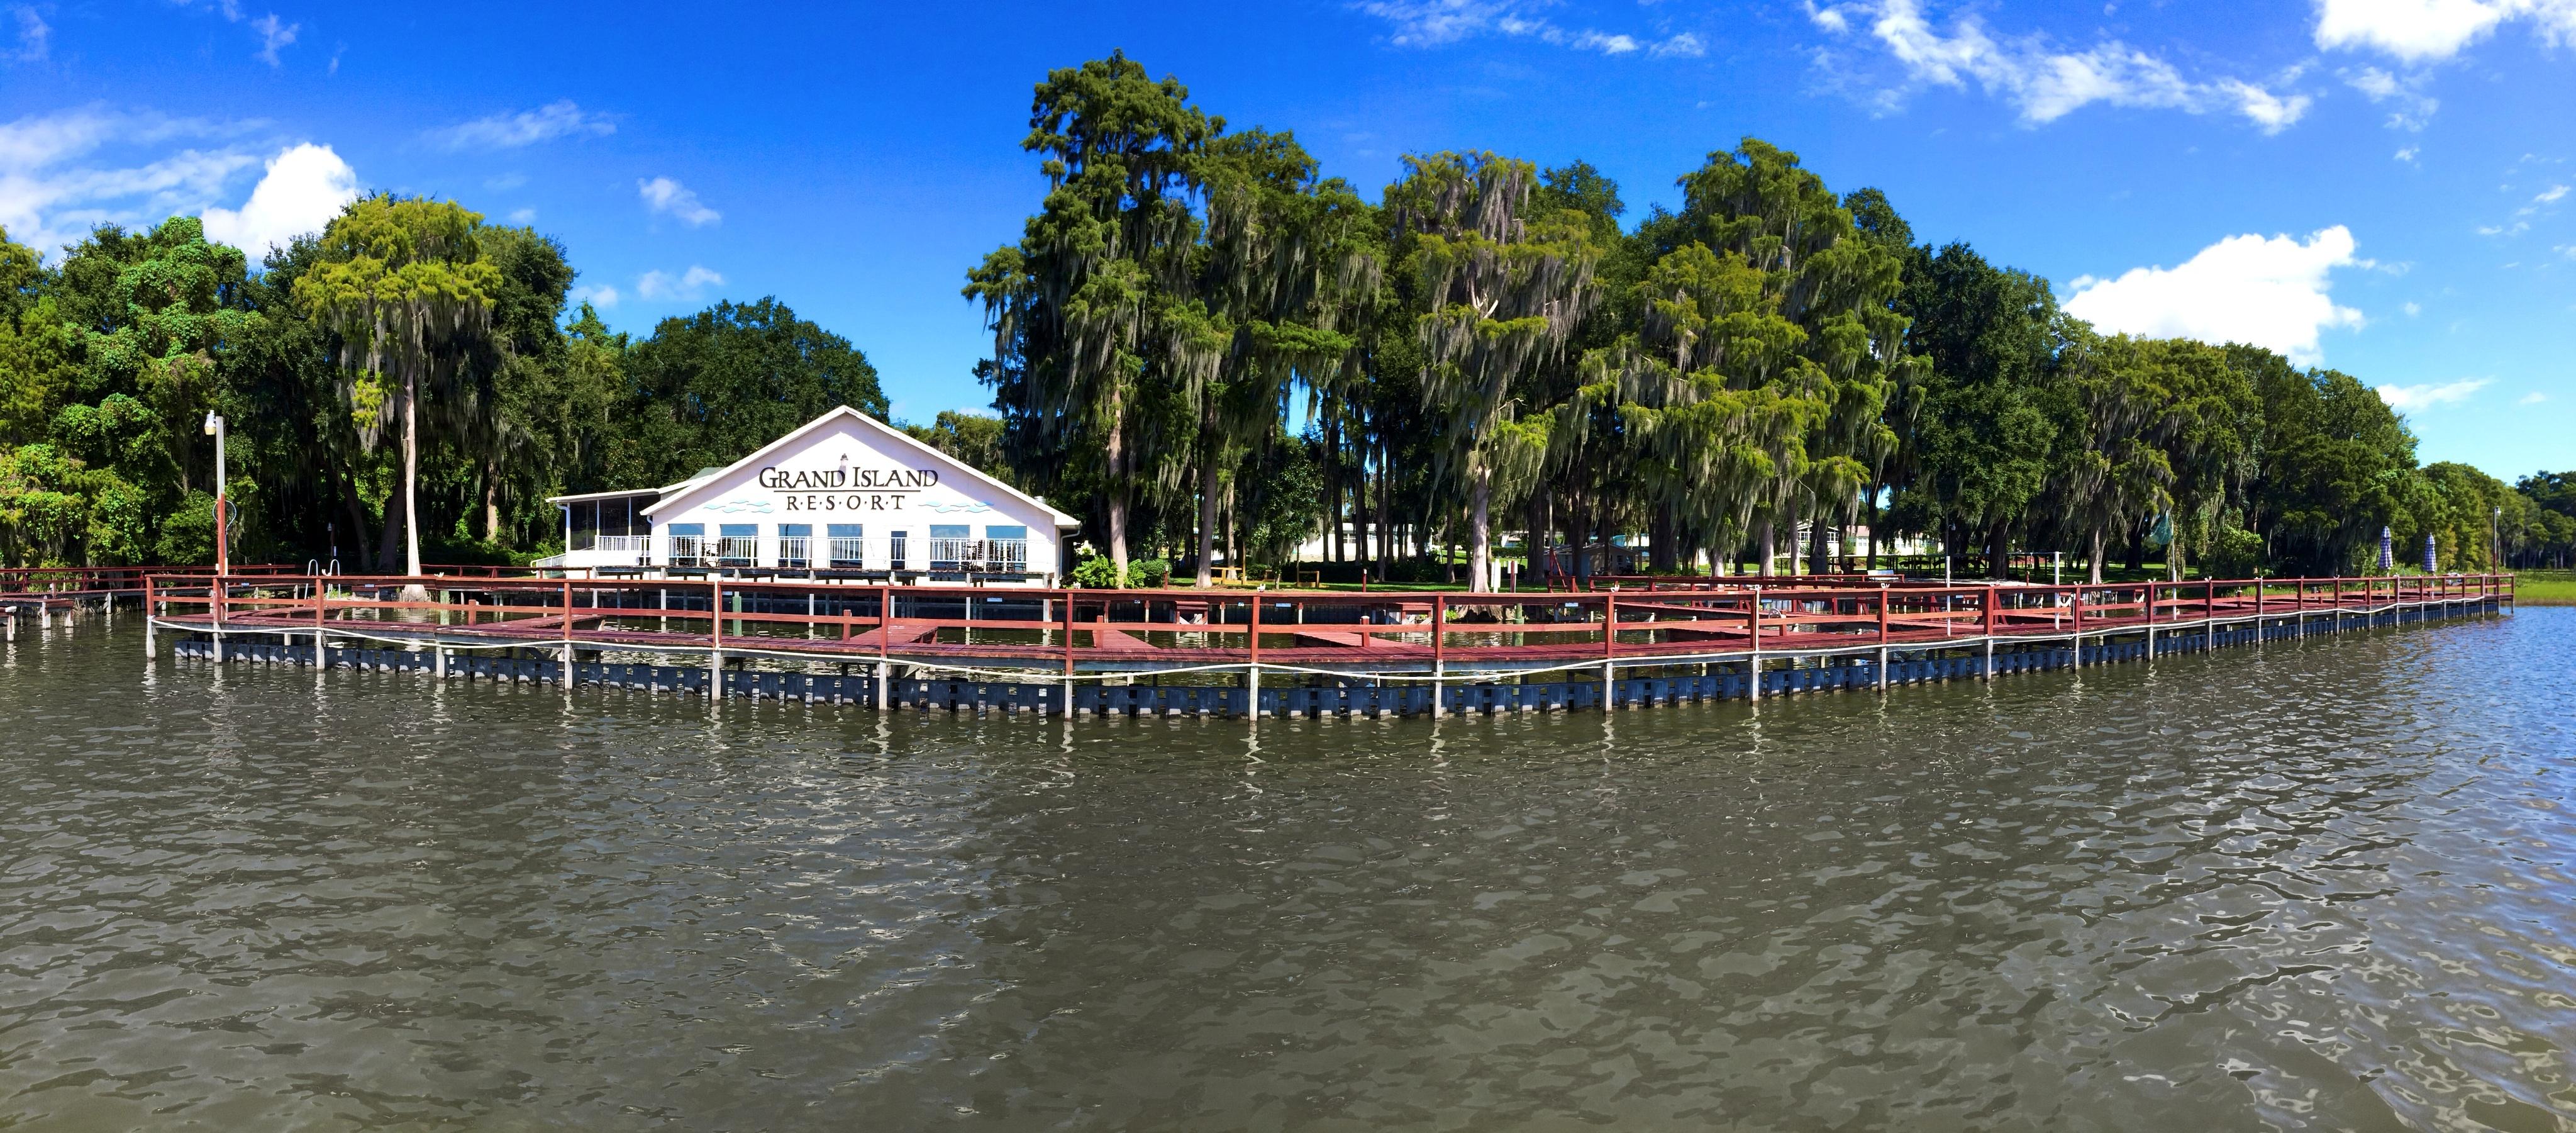 Grand Island Resort image 1